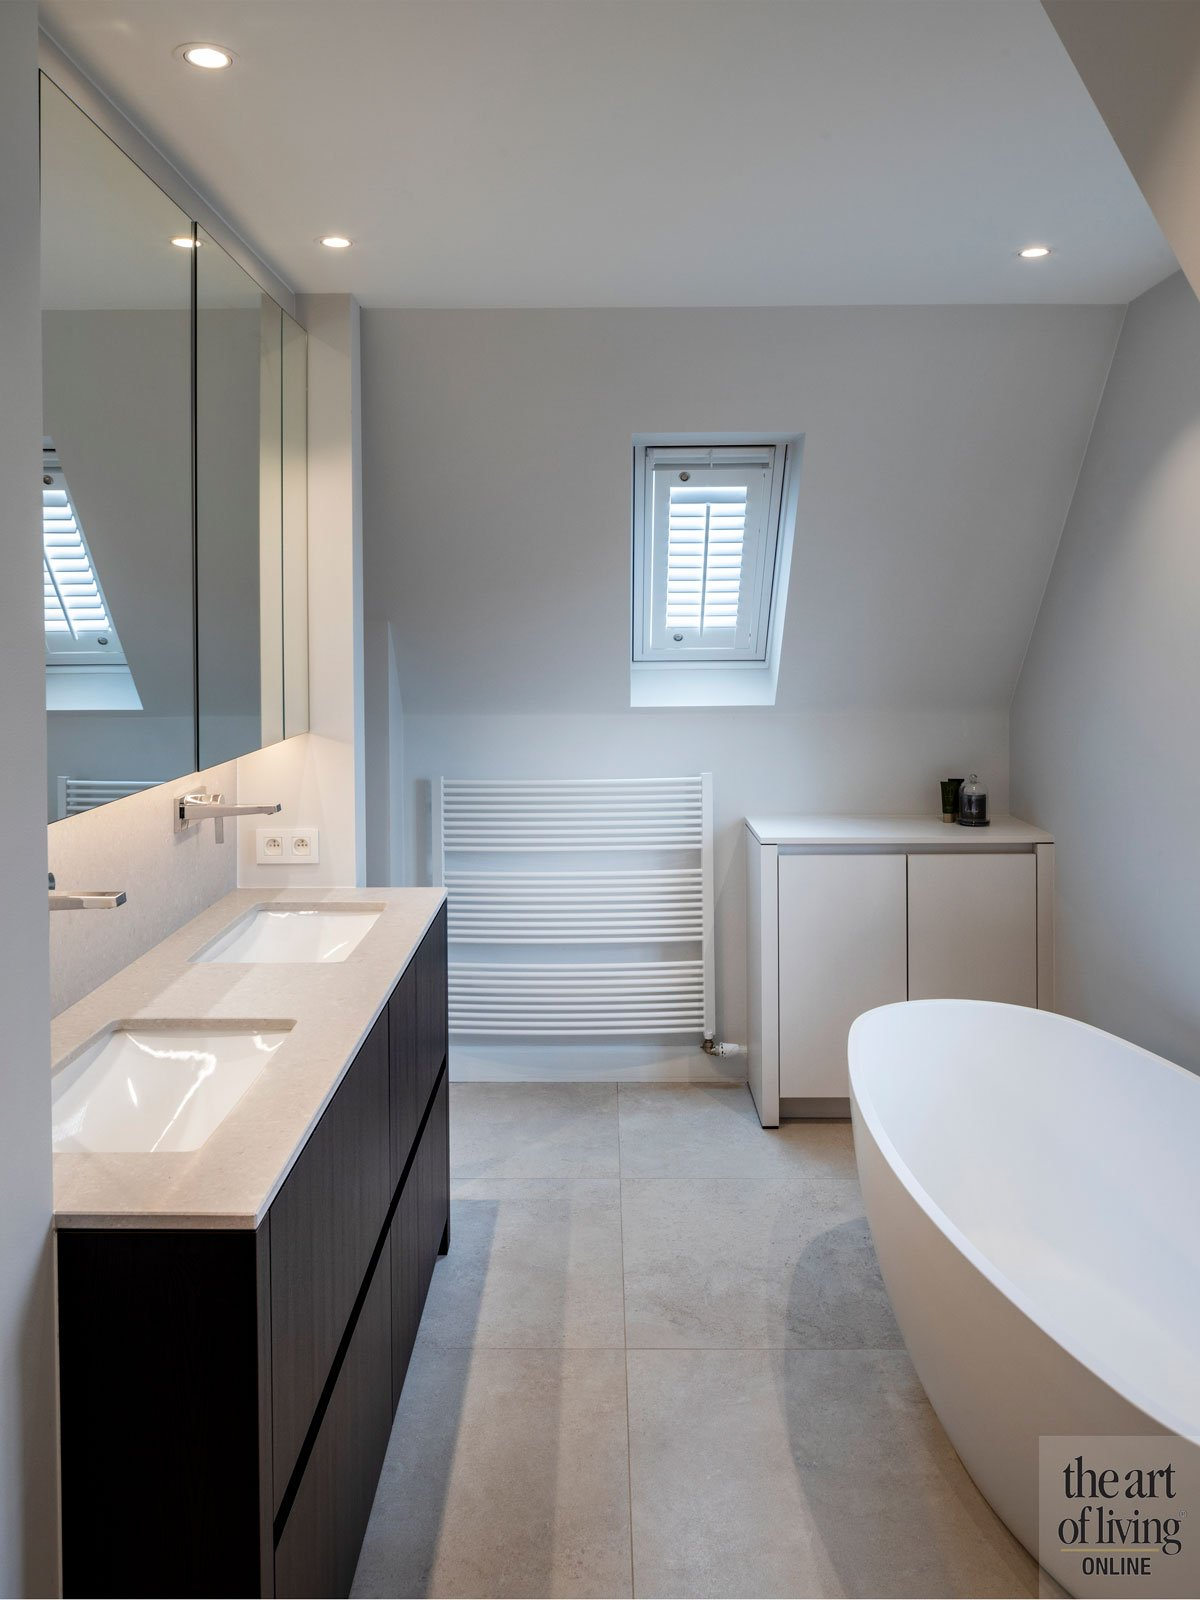 Renovatie | Architectenbureau Nys, the art of living